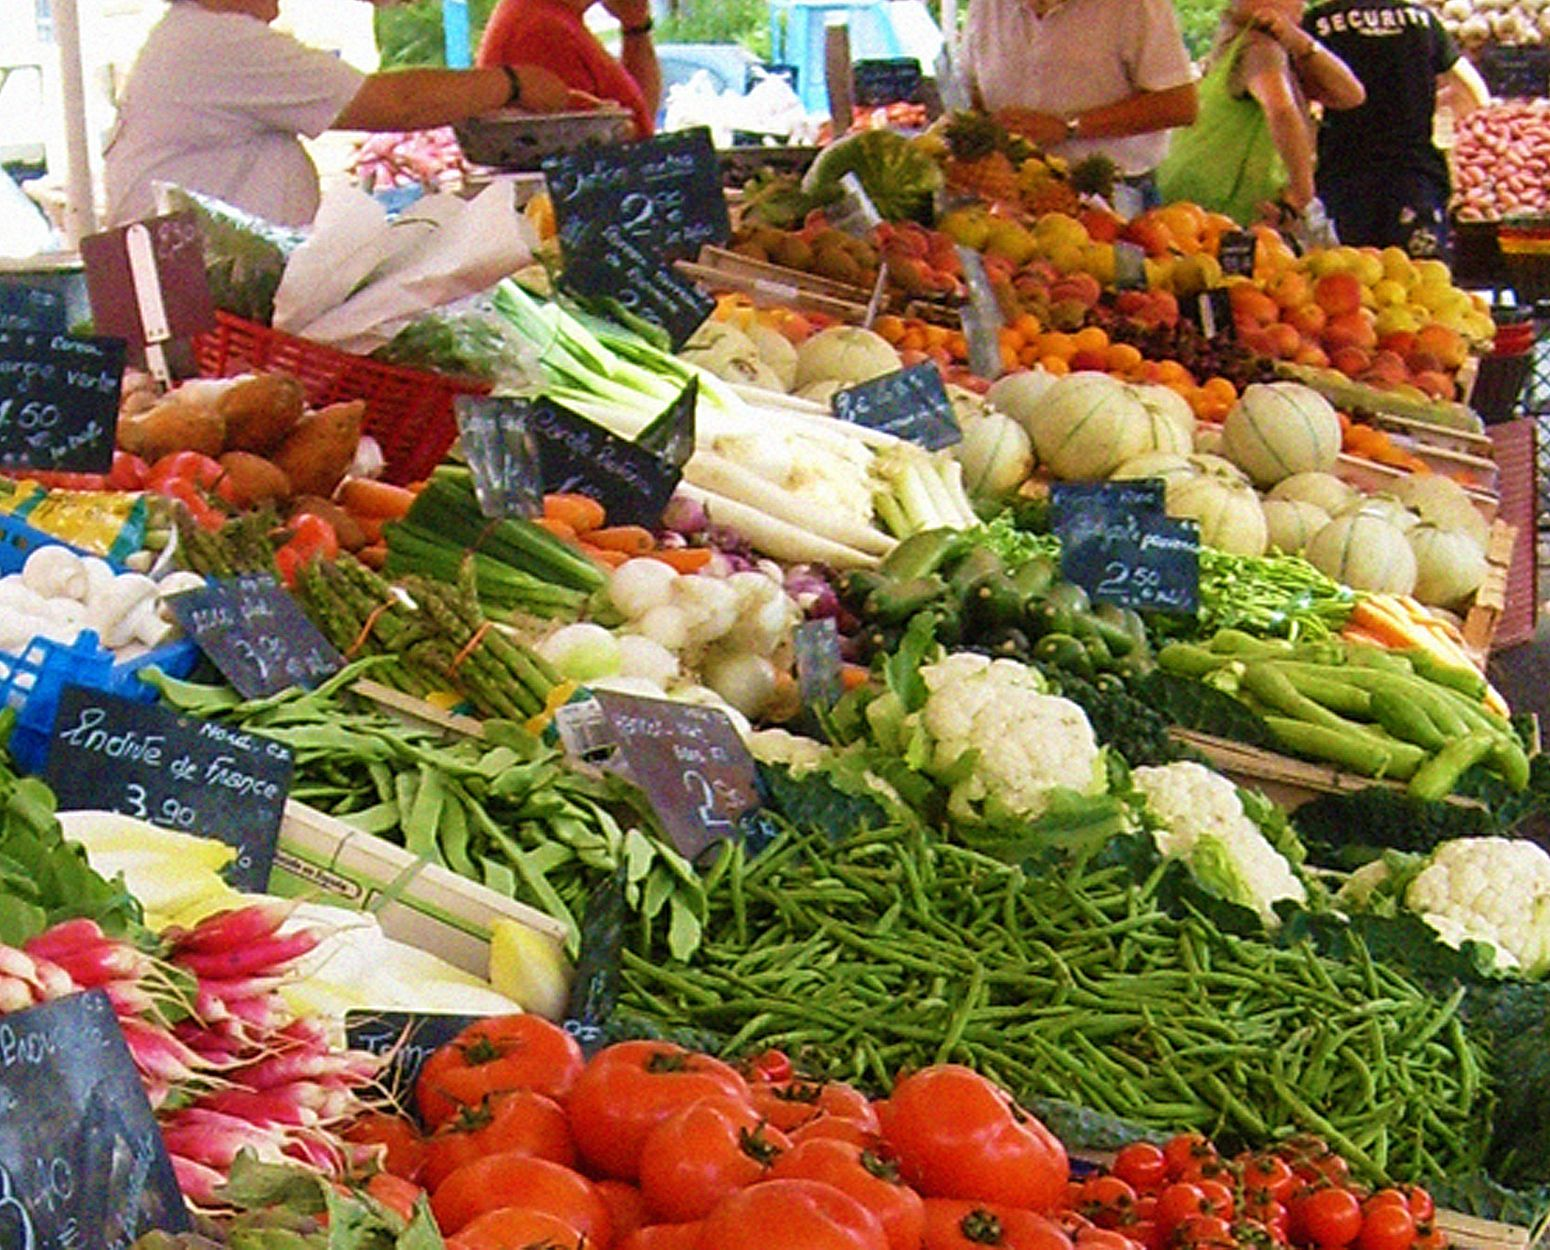 Produe at market